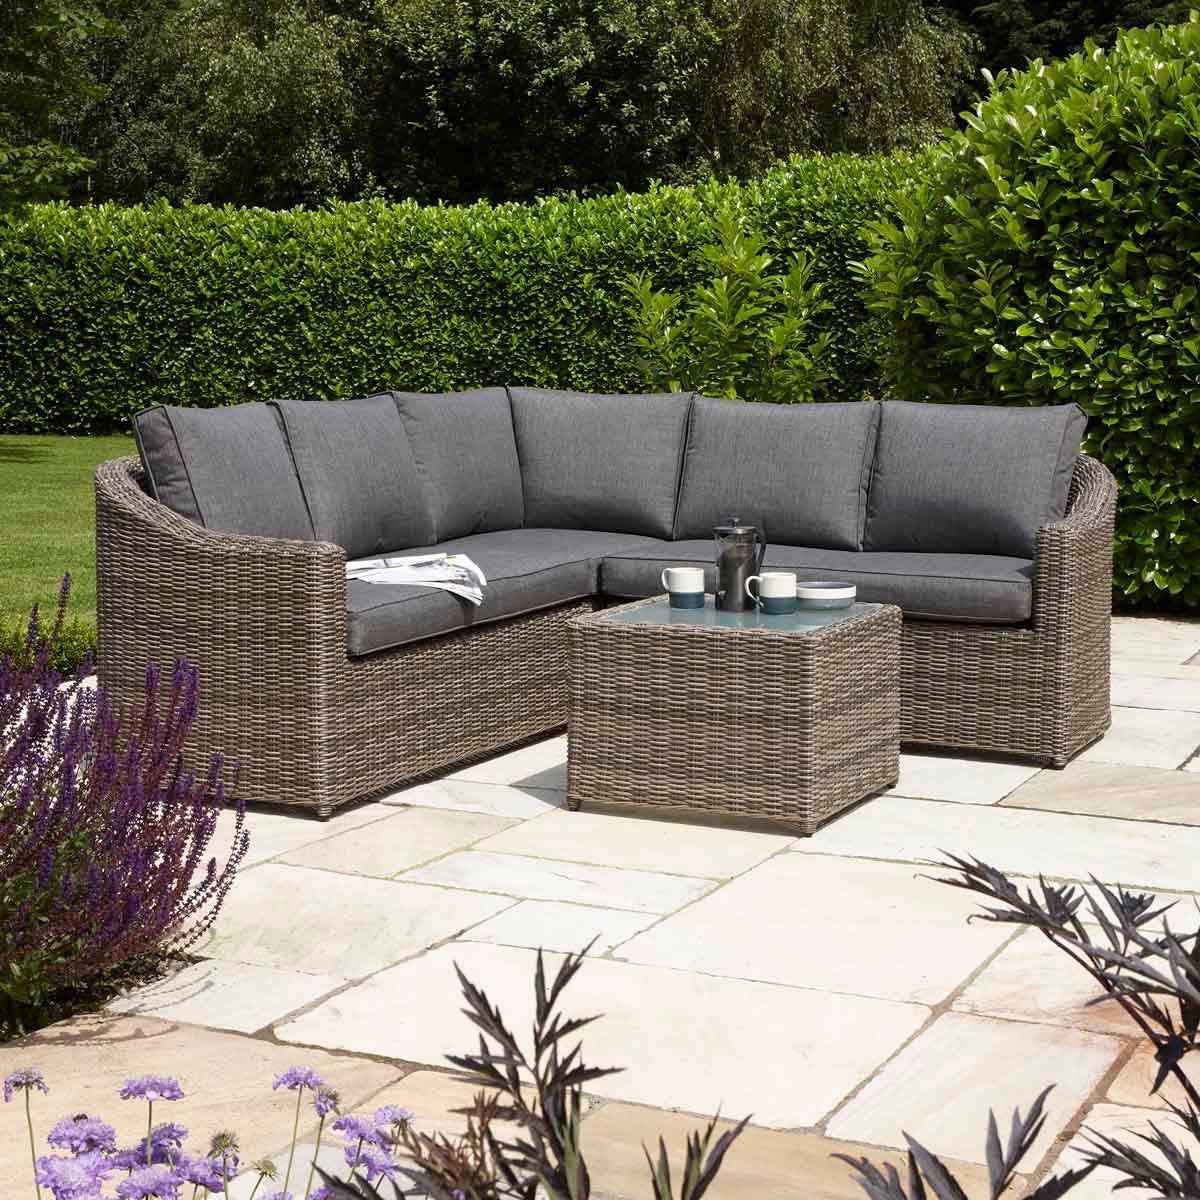 Rowlinson Bunbury Rattan Corner Sofa Set - Natural/Grey